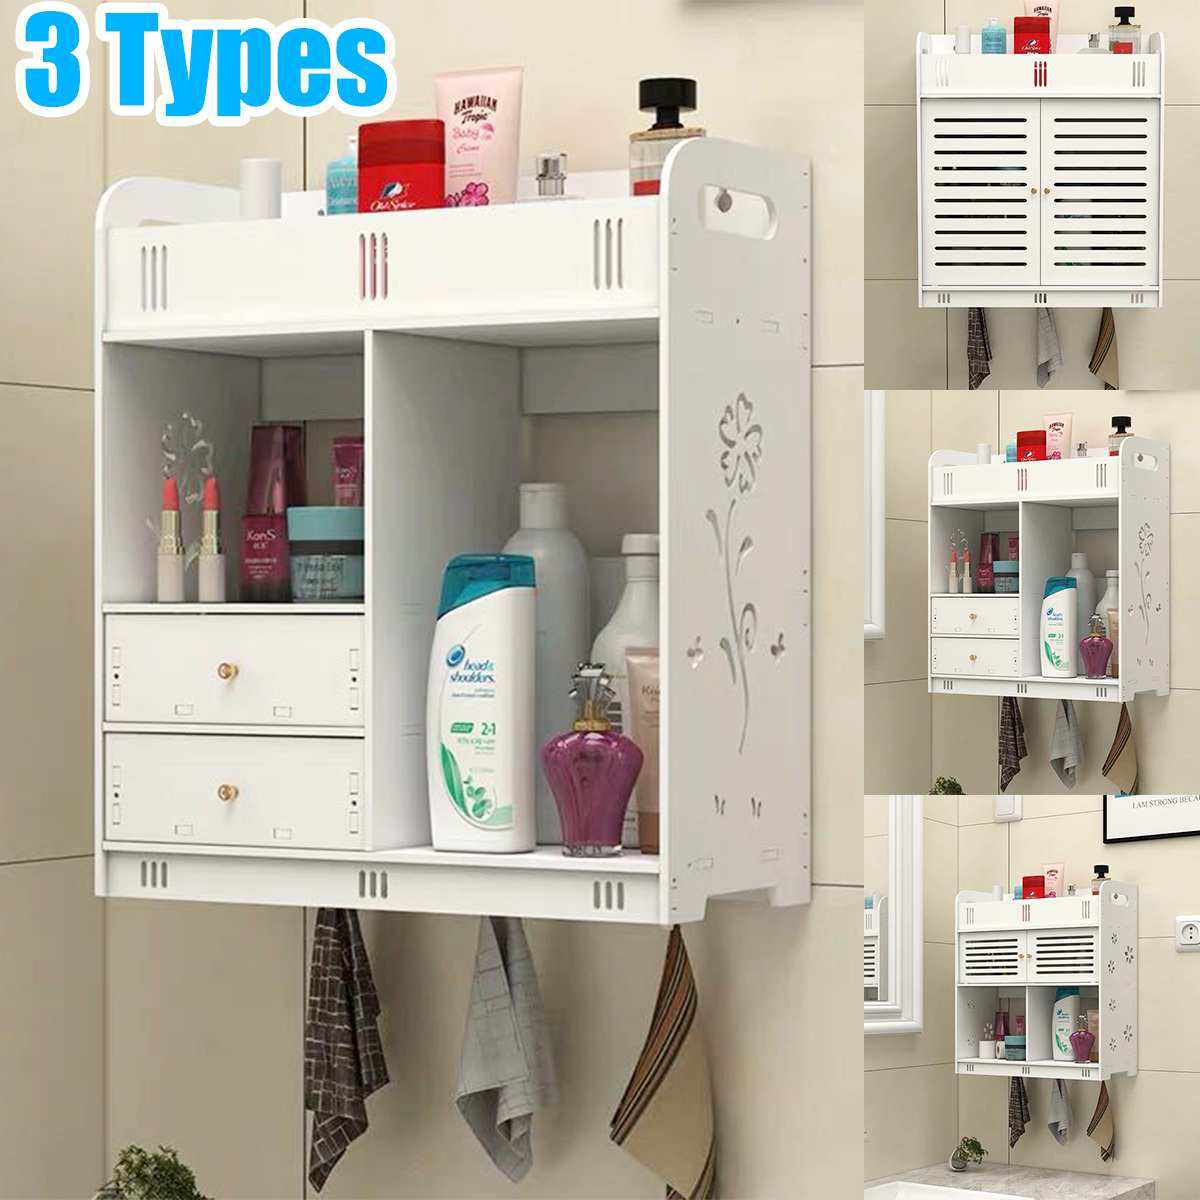 Bathroom Cabinet Cabinet Wall Mounted Storage Organizer Home Toilet Shelf Rack Ebay